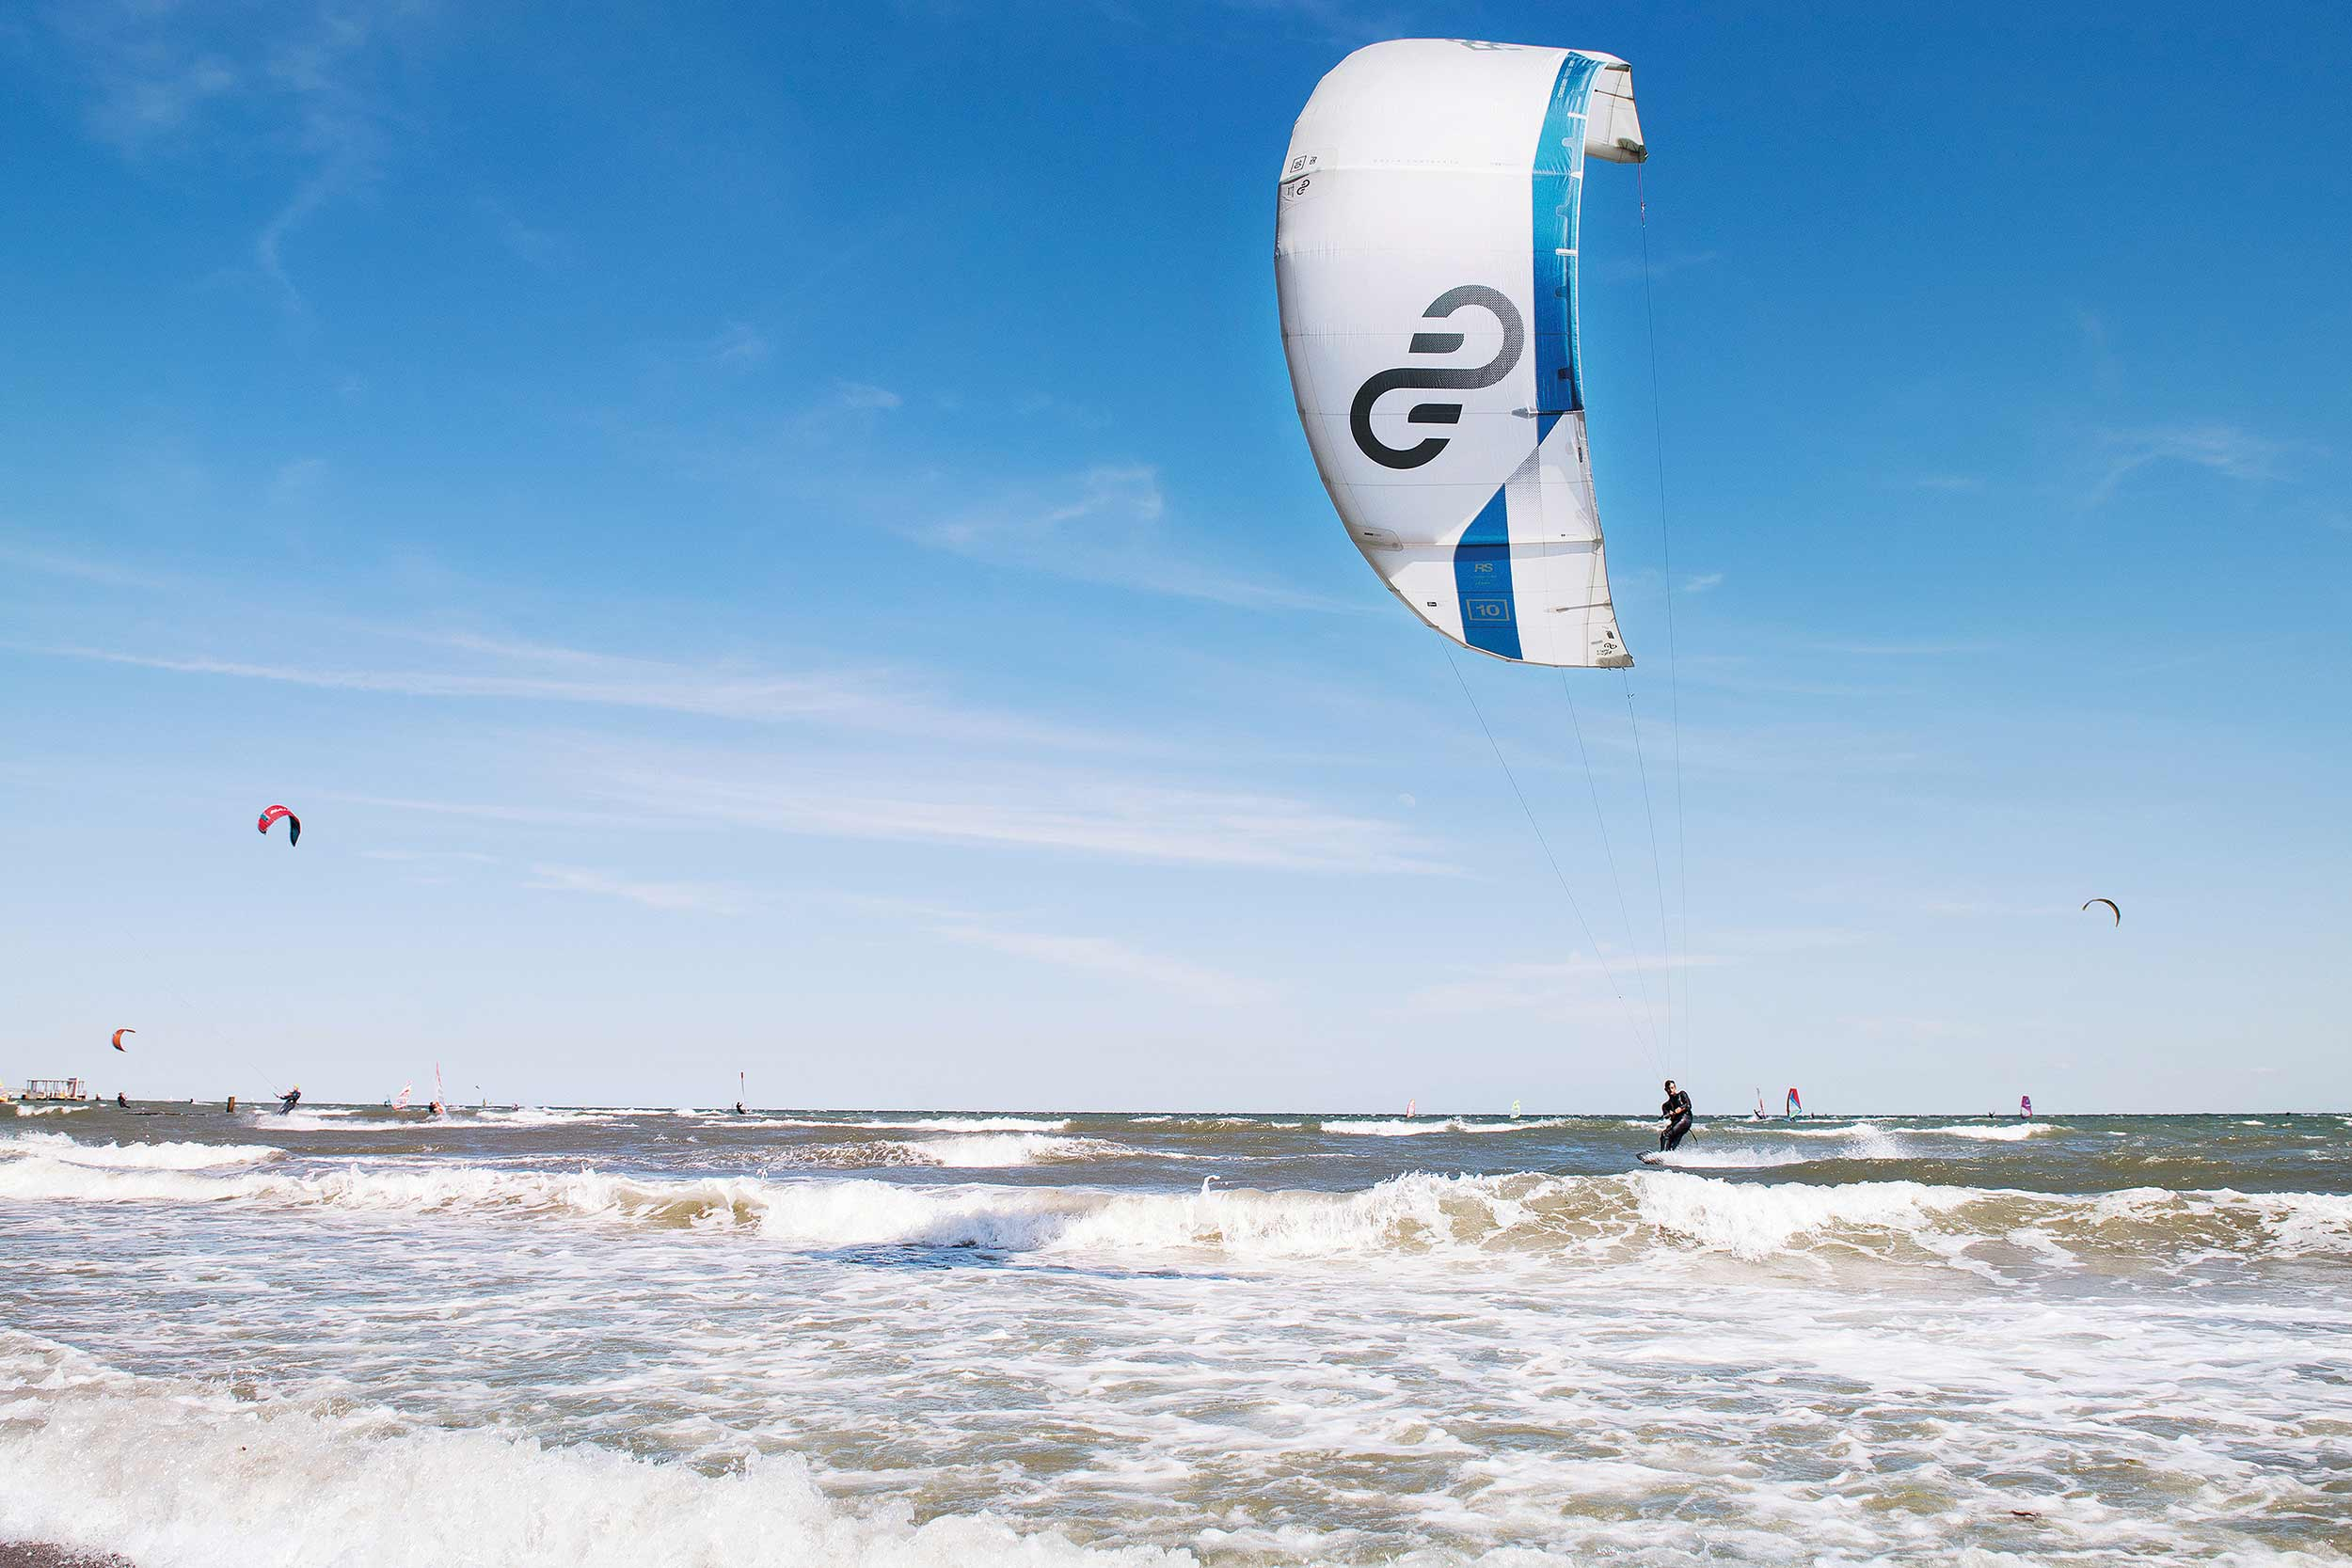 Eleveight RS kite test in Kiteworld Magazine